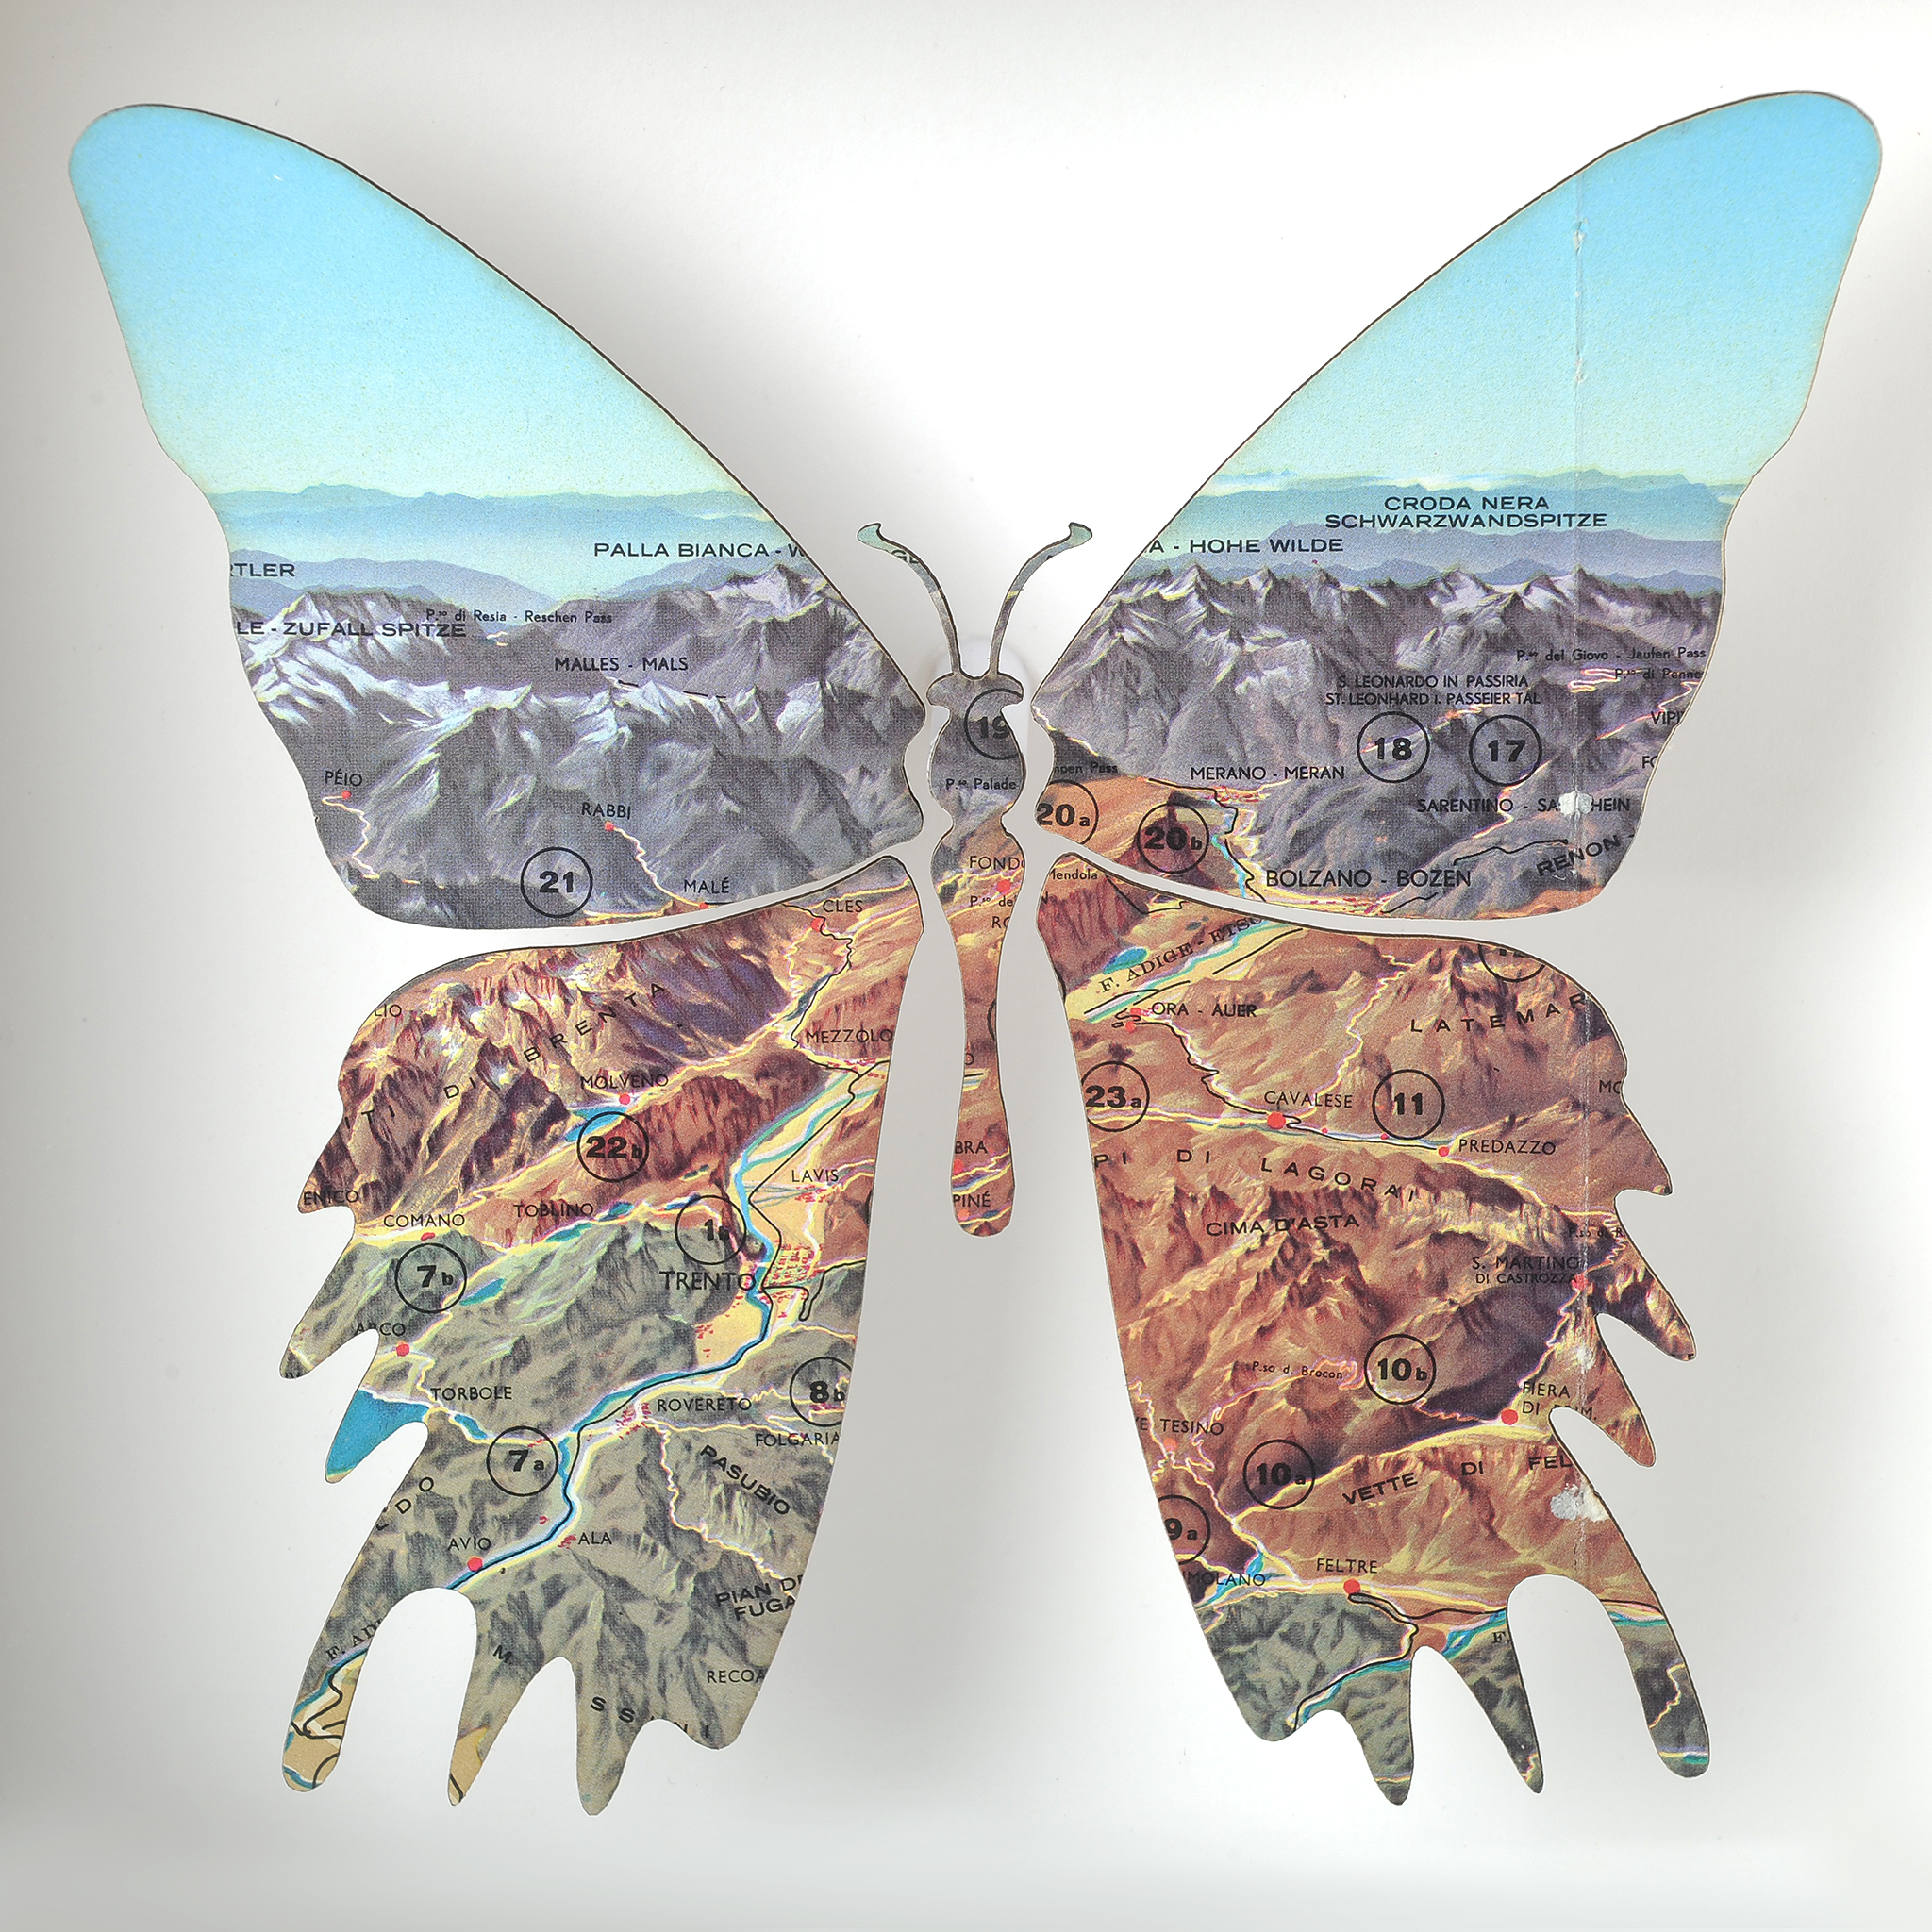 butterfly-effect-map-mountain-artwork